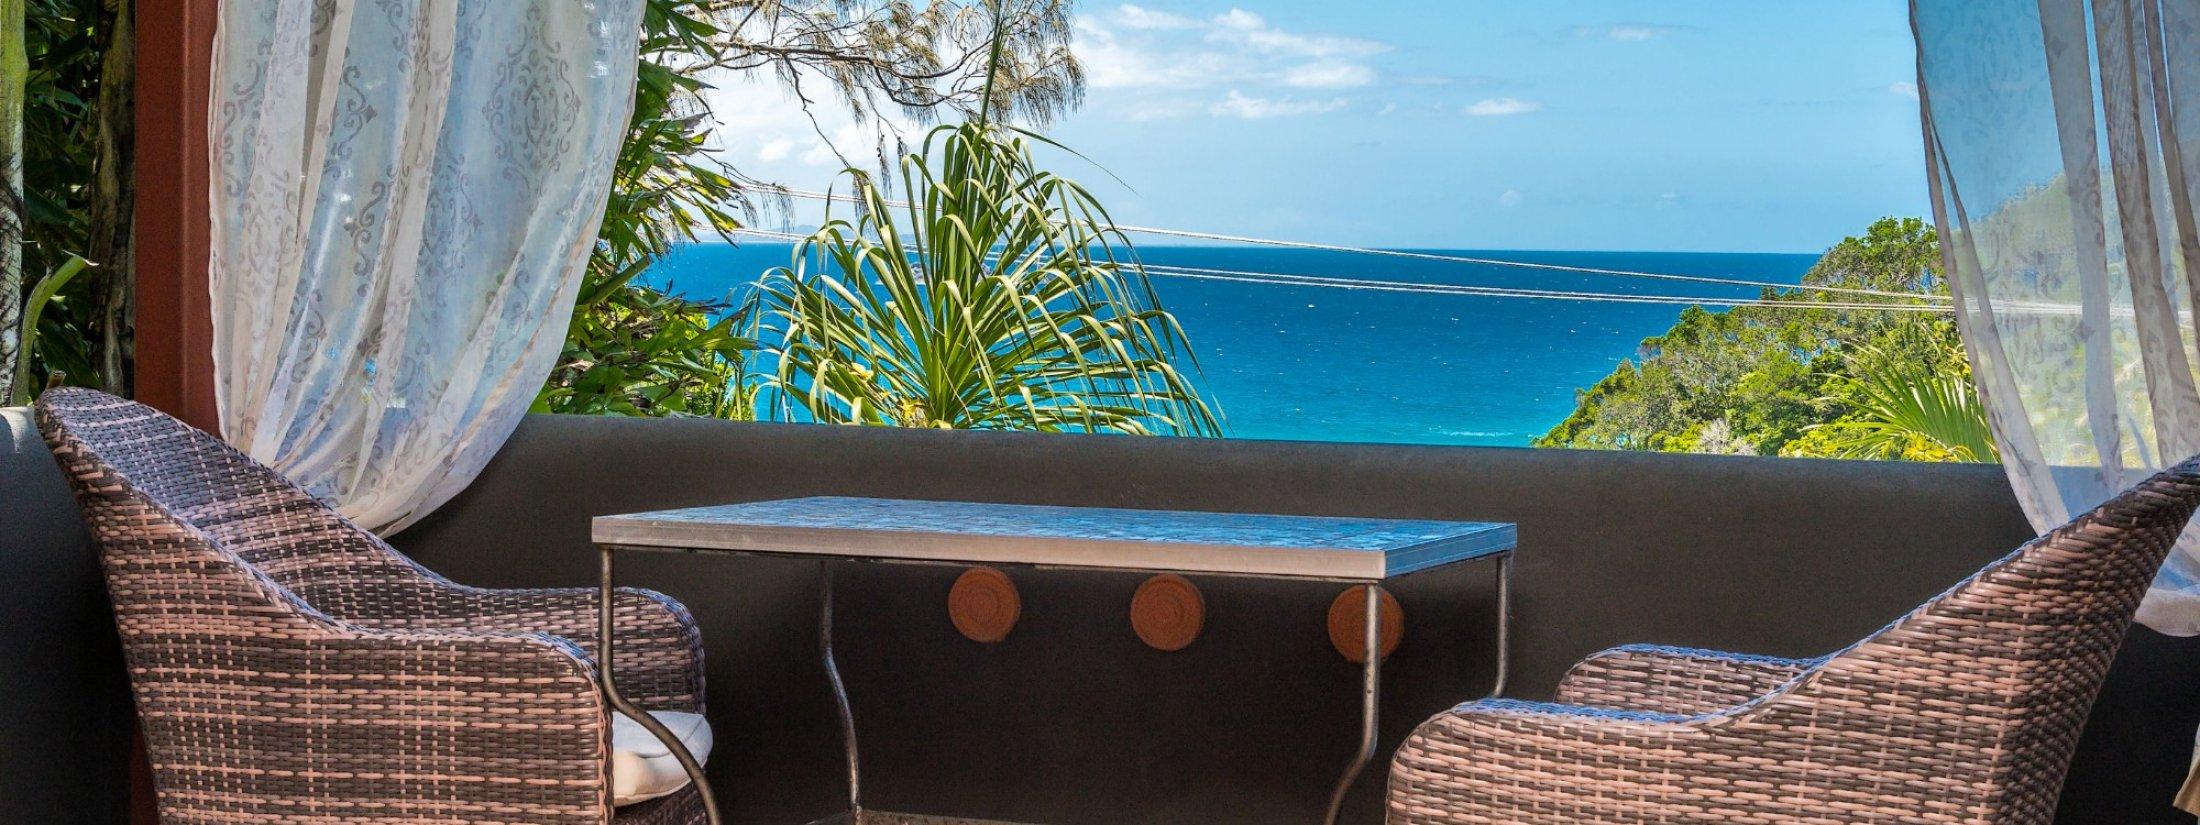 Wategos Retreats - Wategos Beach - Byron Bay - Outdoor setting views